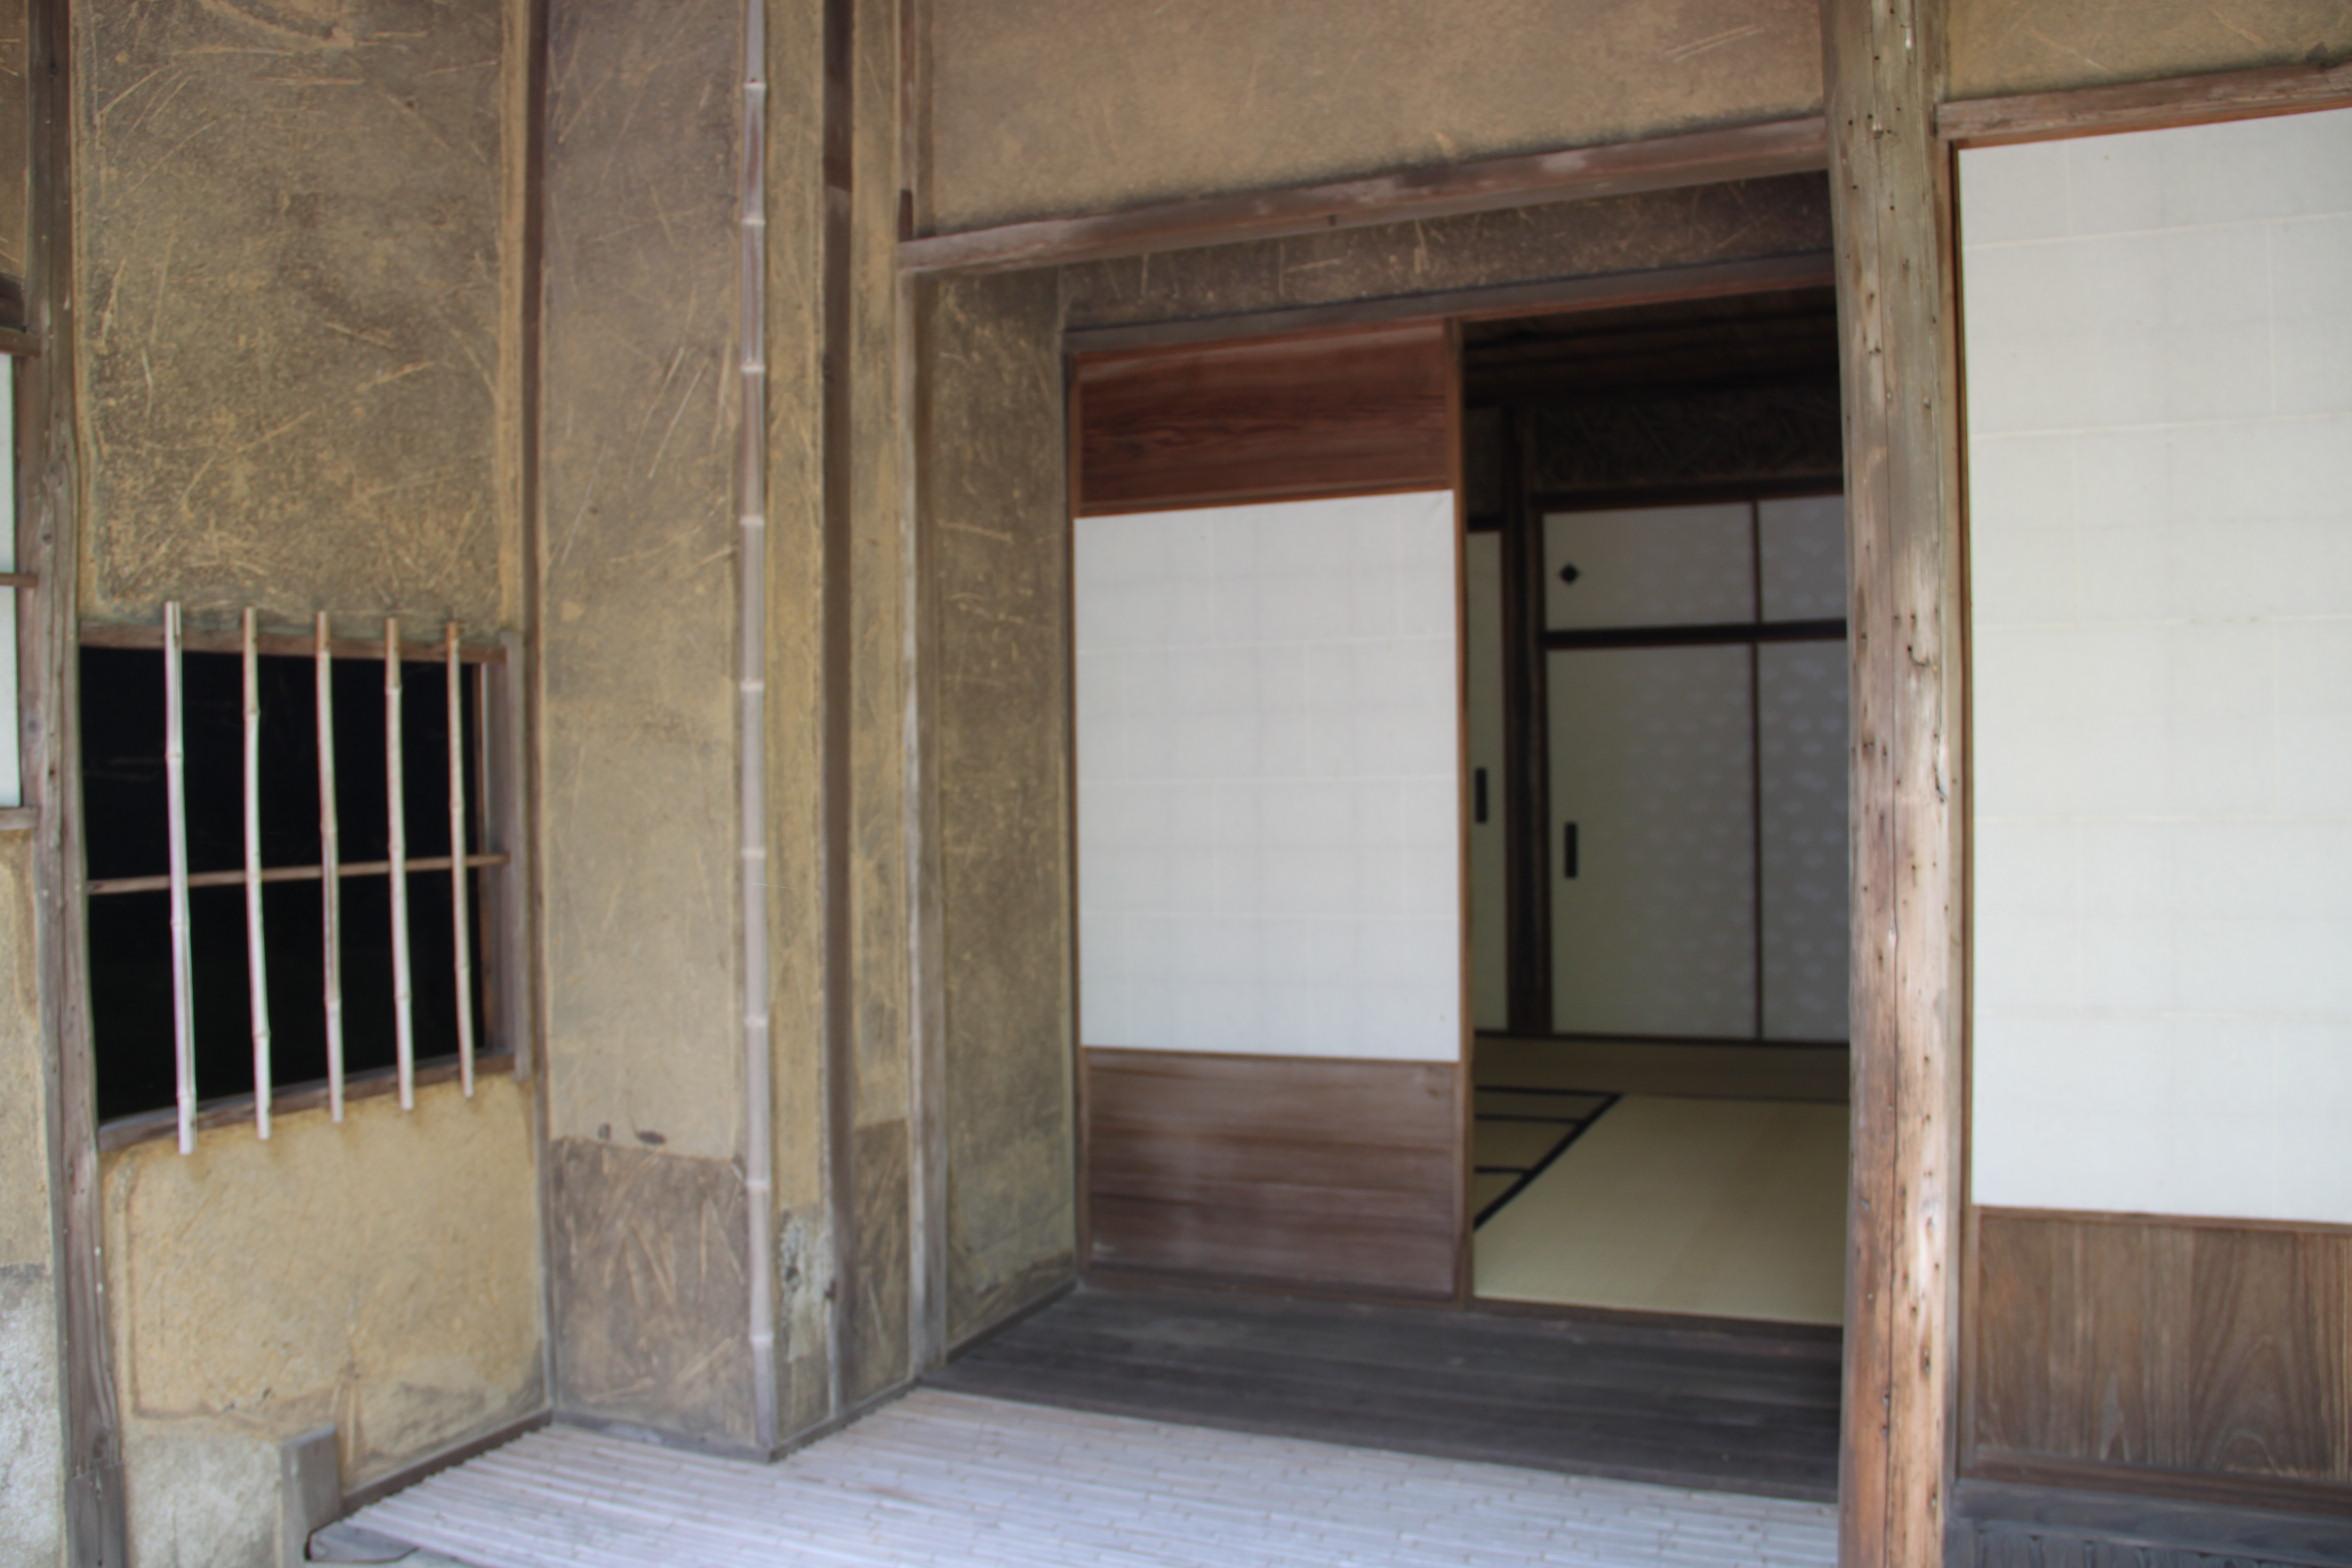 Japan Zen Reise, Kyoto, Teezeremonie, japanisches Teehaus